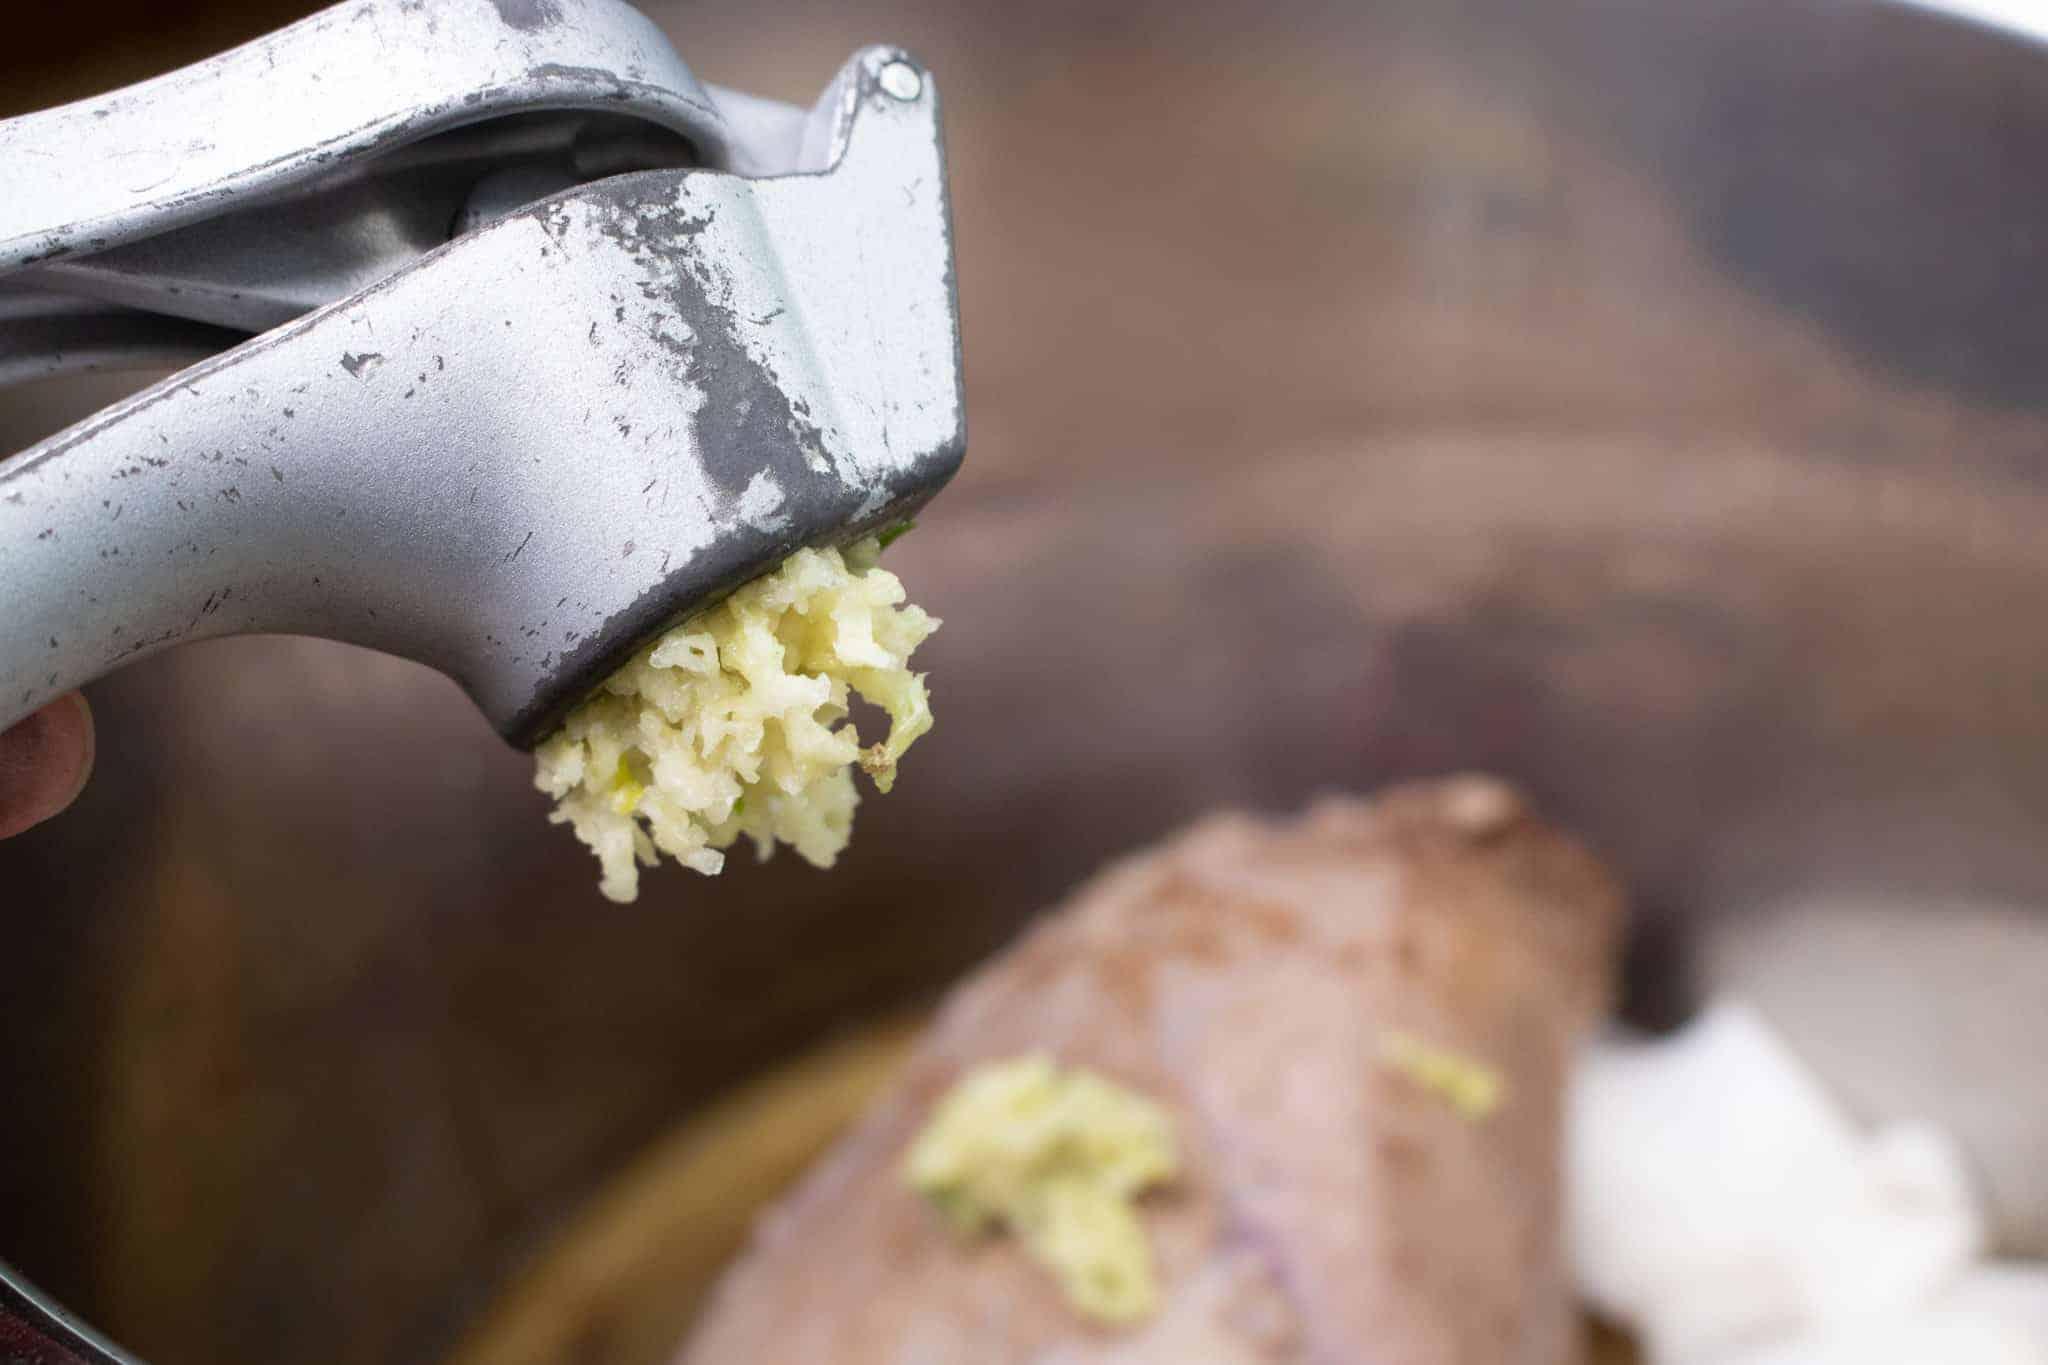 Yum, garlic makes your easy instant pot pot roast even tastier!